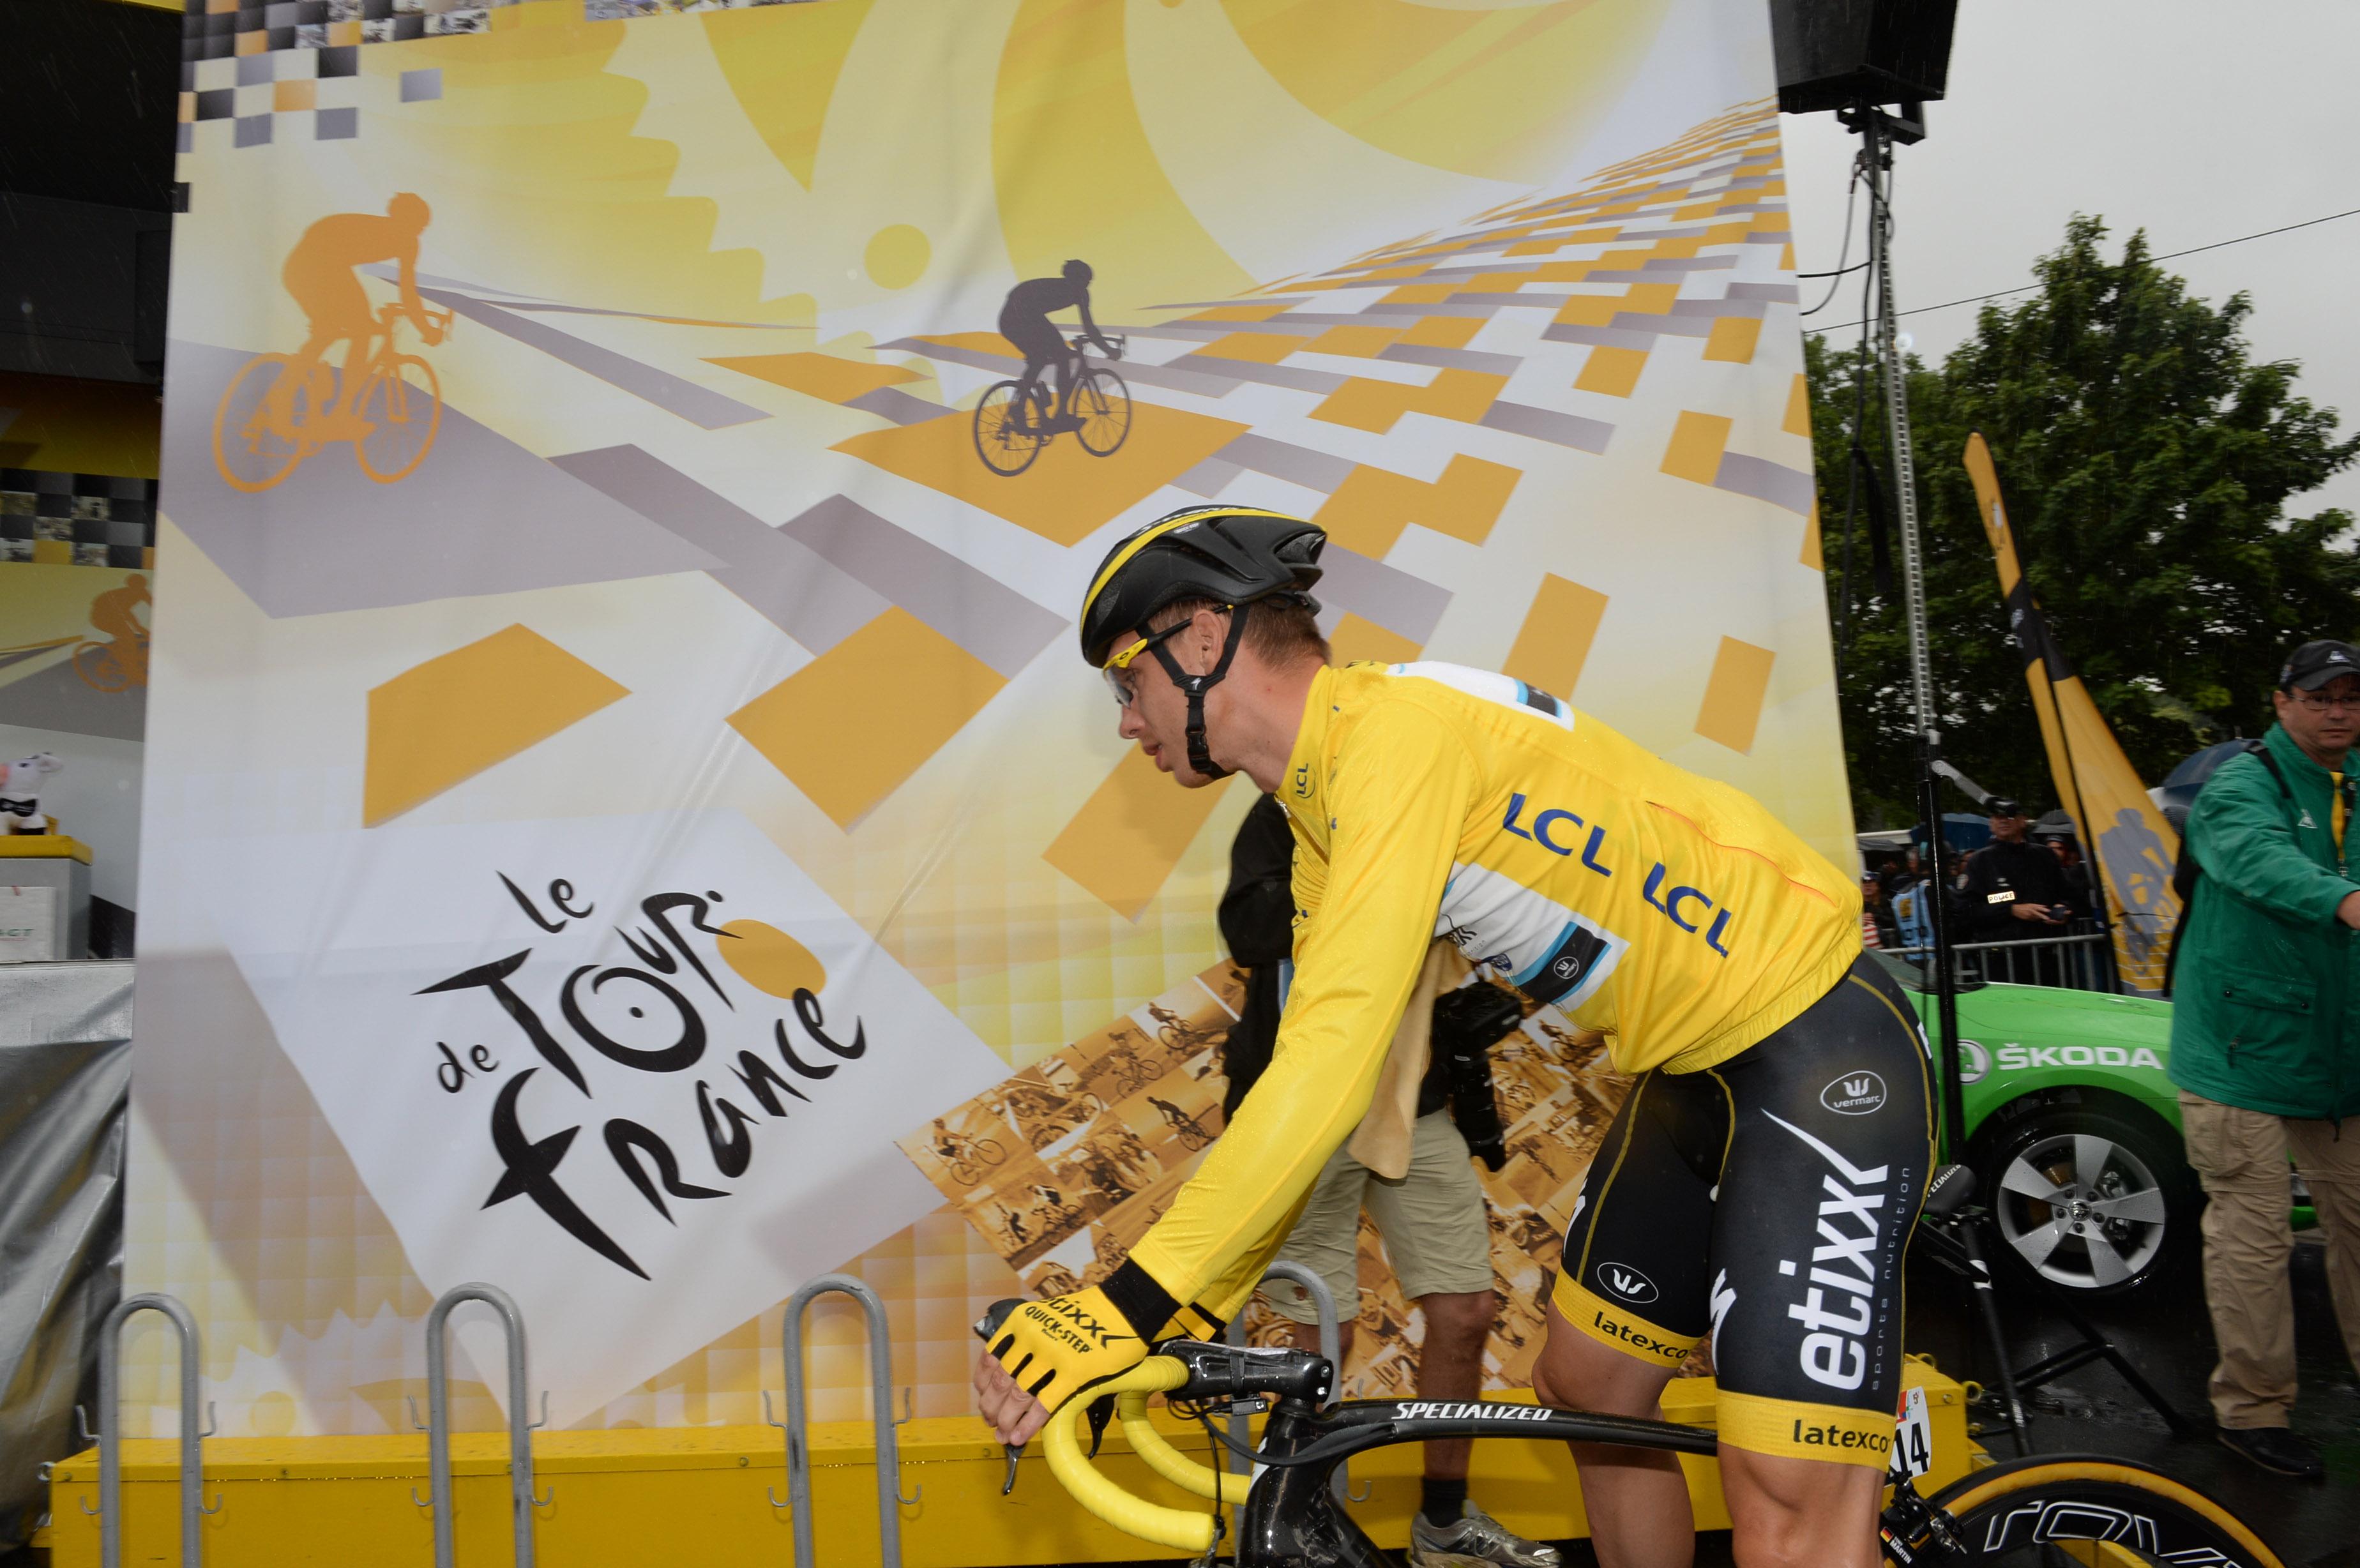 Tony Martin konnte das Gelbe Trikot verteidigen! (pic: Sirotti)